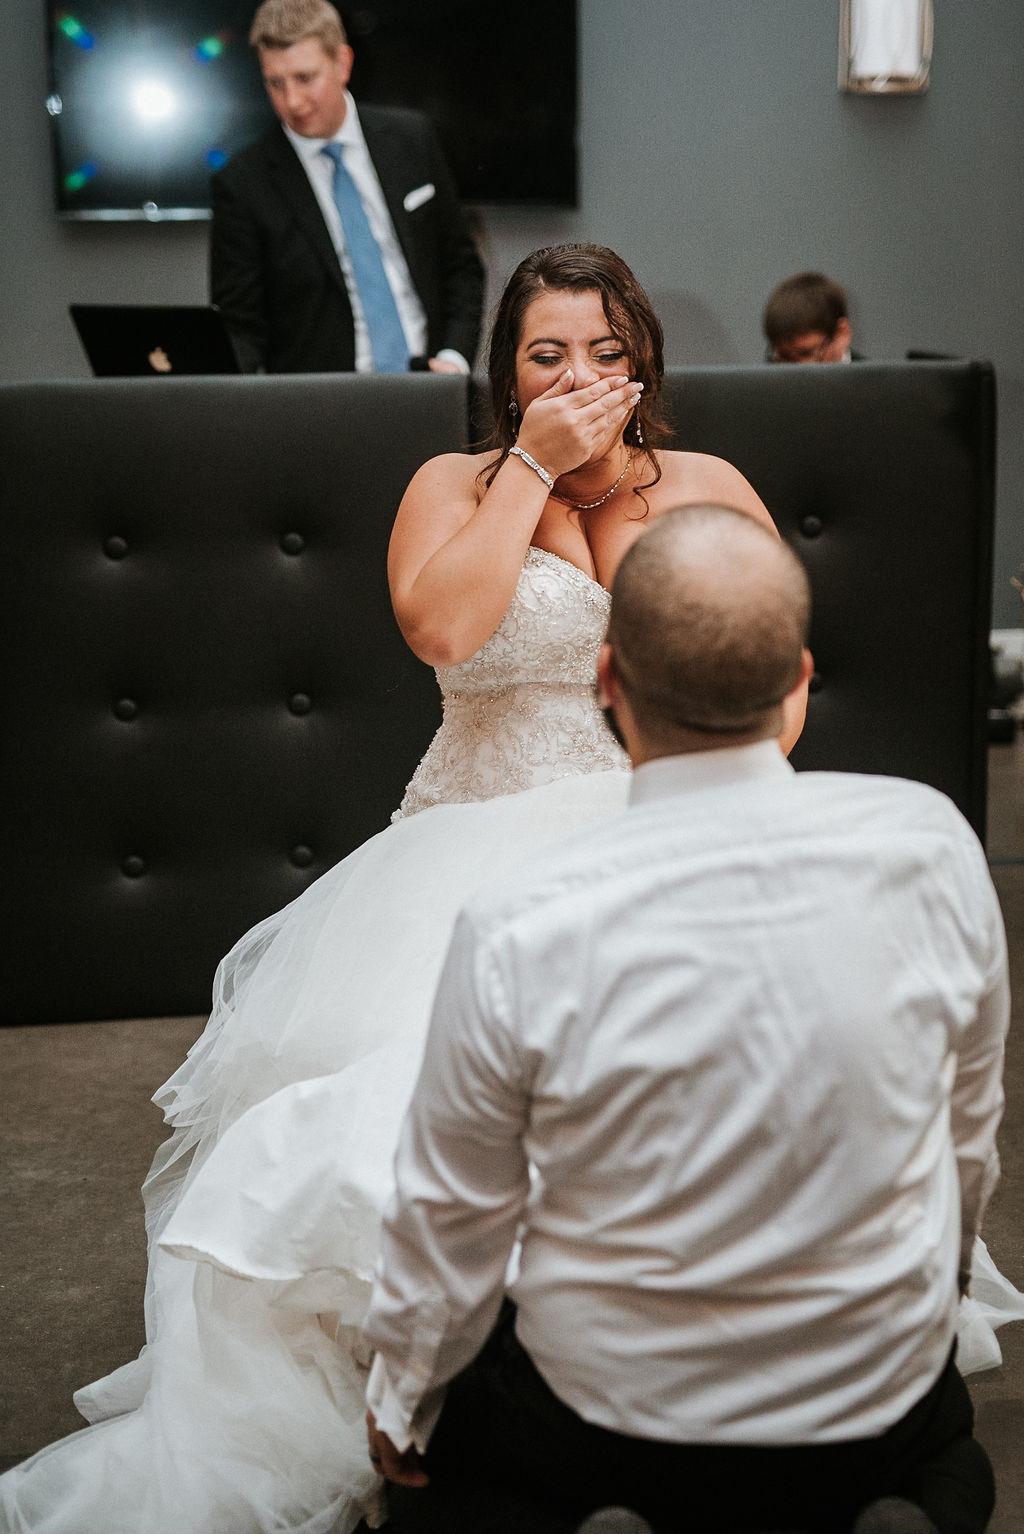 Groom Removing Bride's Garter